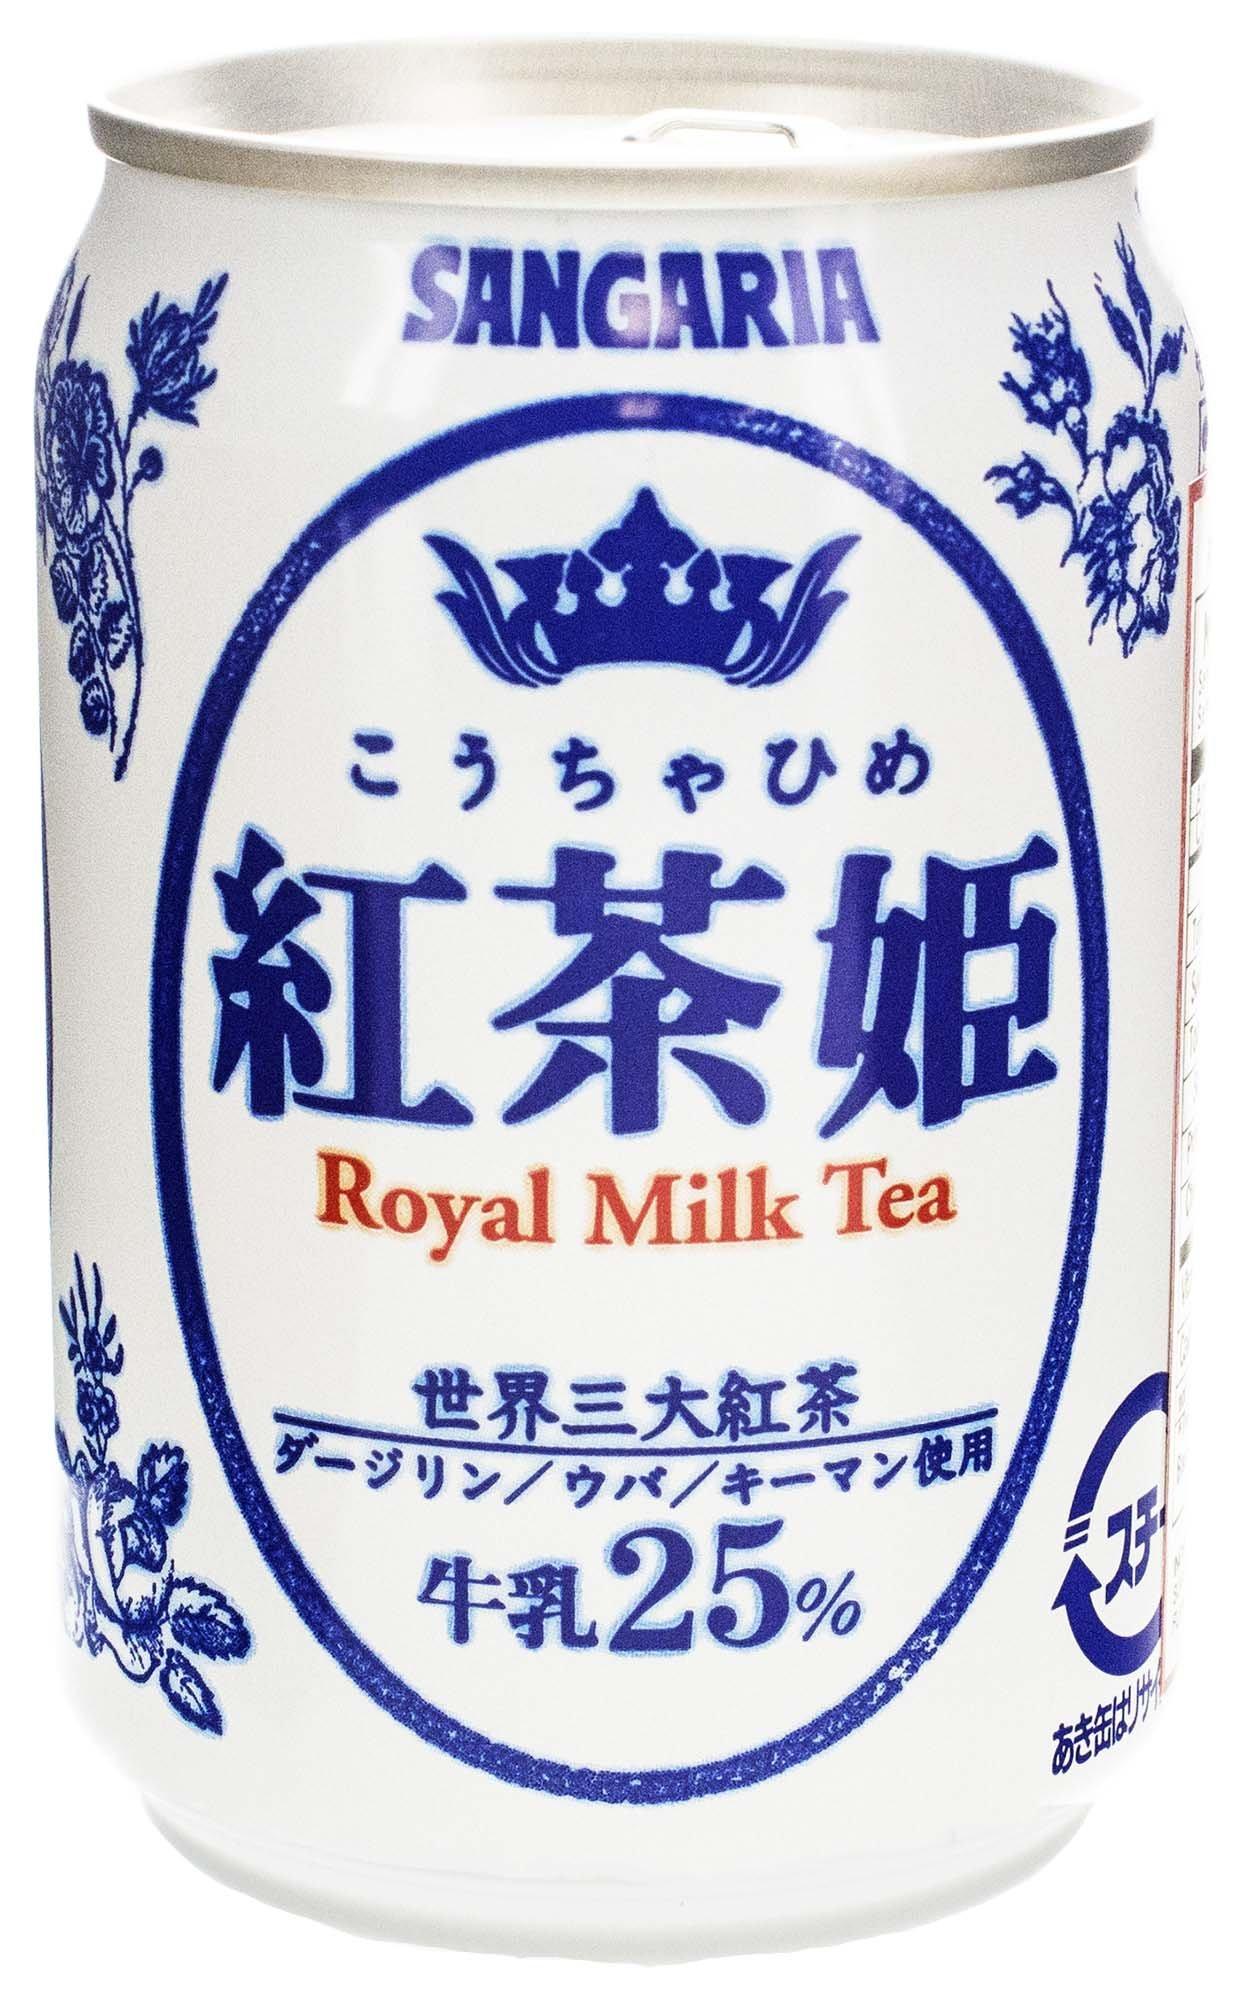 Sangaria Royal Milk Tea, 9.47 Fluid Ounce (Pack of 24) by SANGARIA